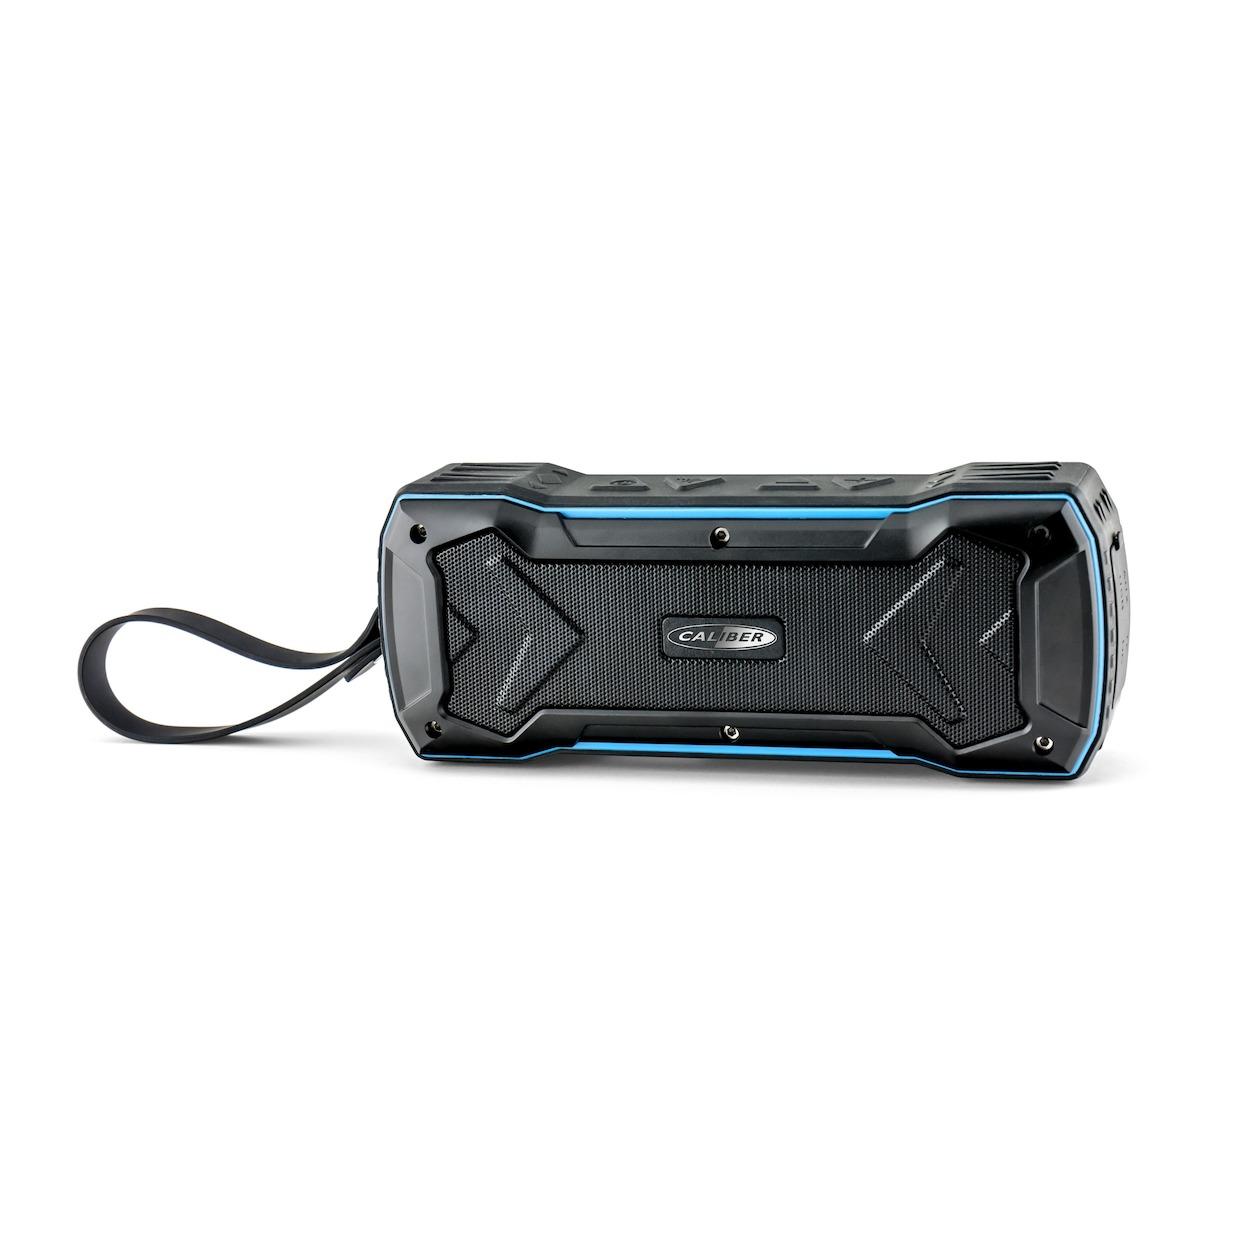 Caliber bluetooth speaker HPG328BT